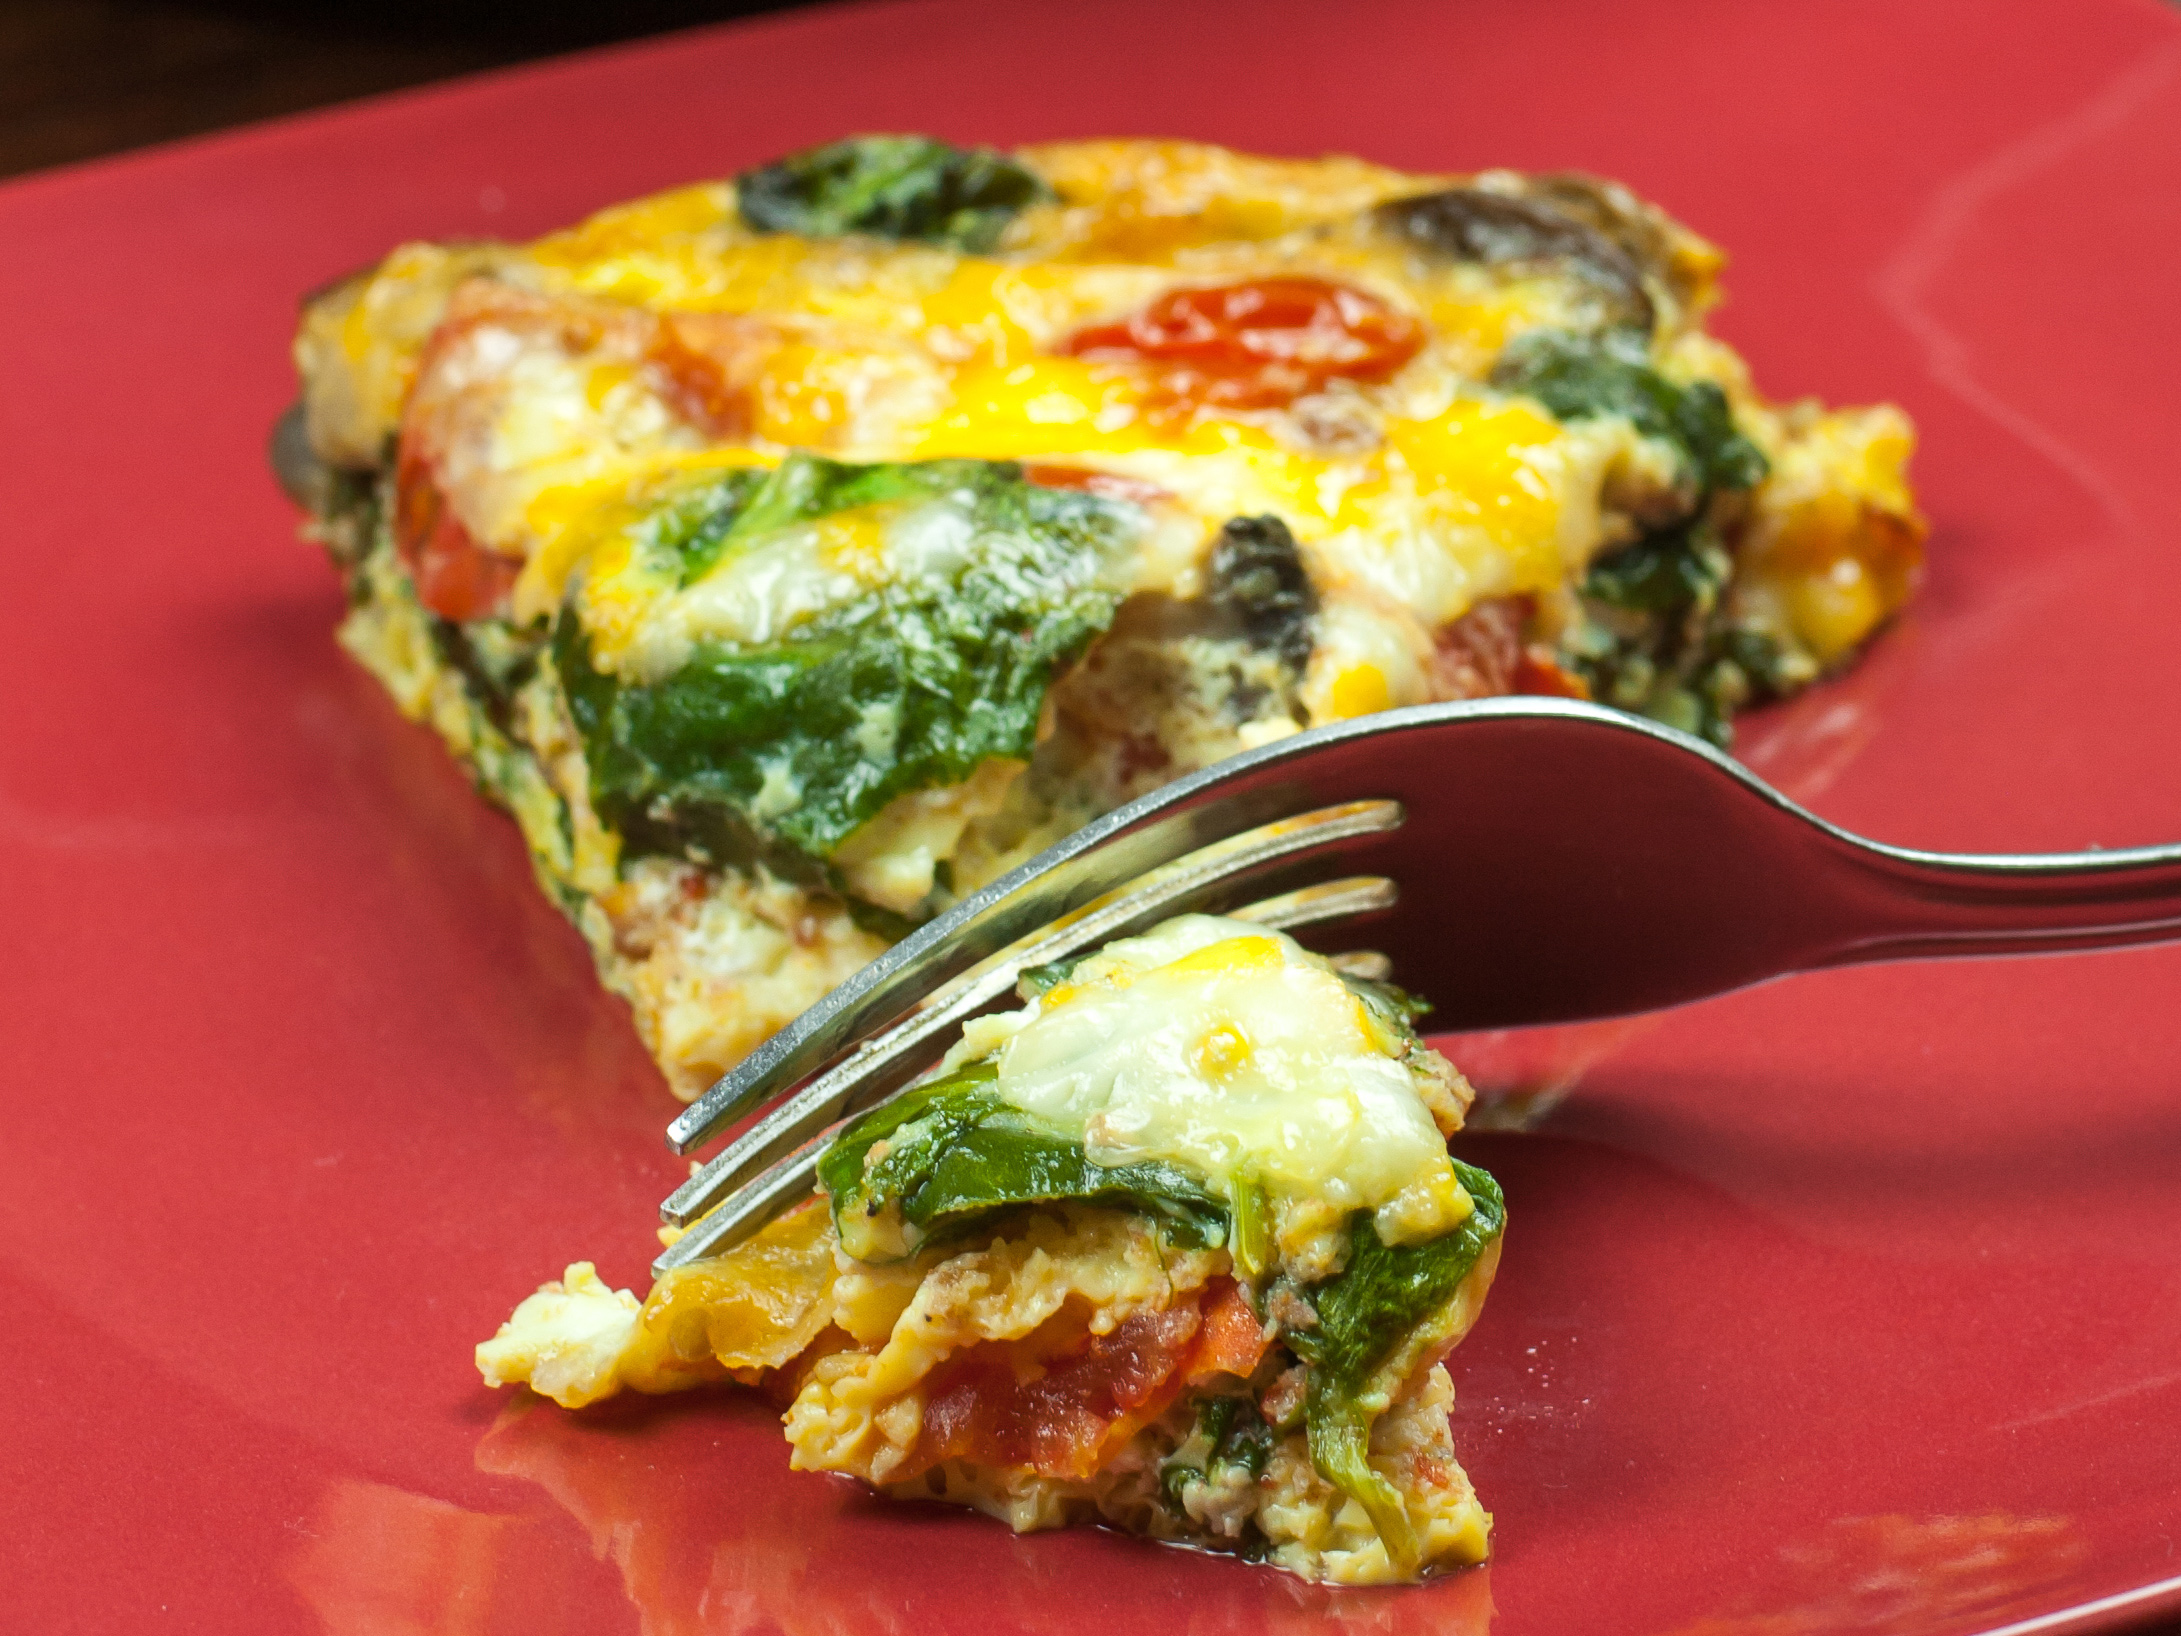 In the kitchen with Kelley: Eggs-cellent breakfast casserole